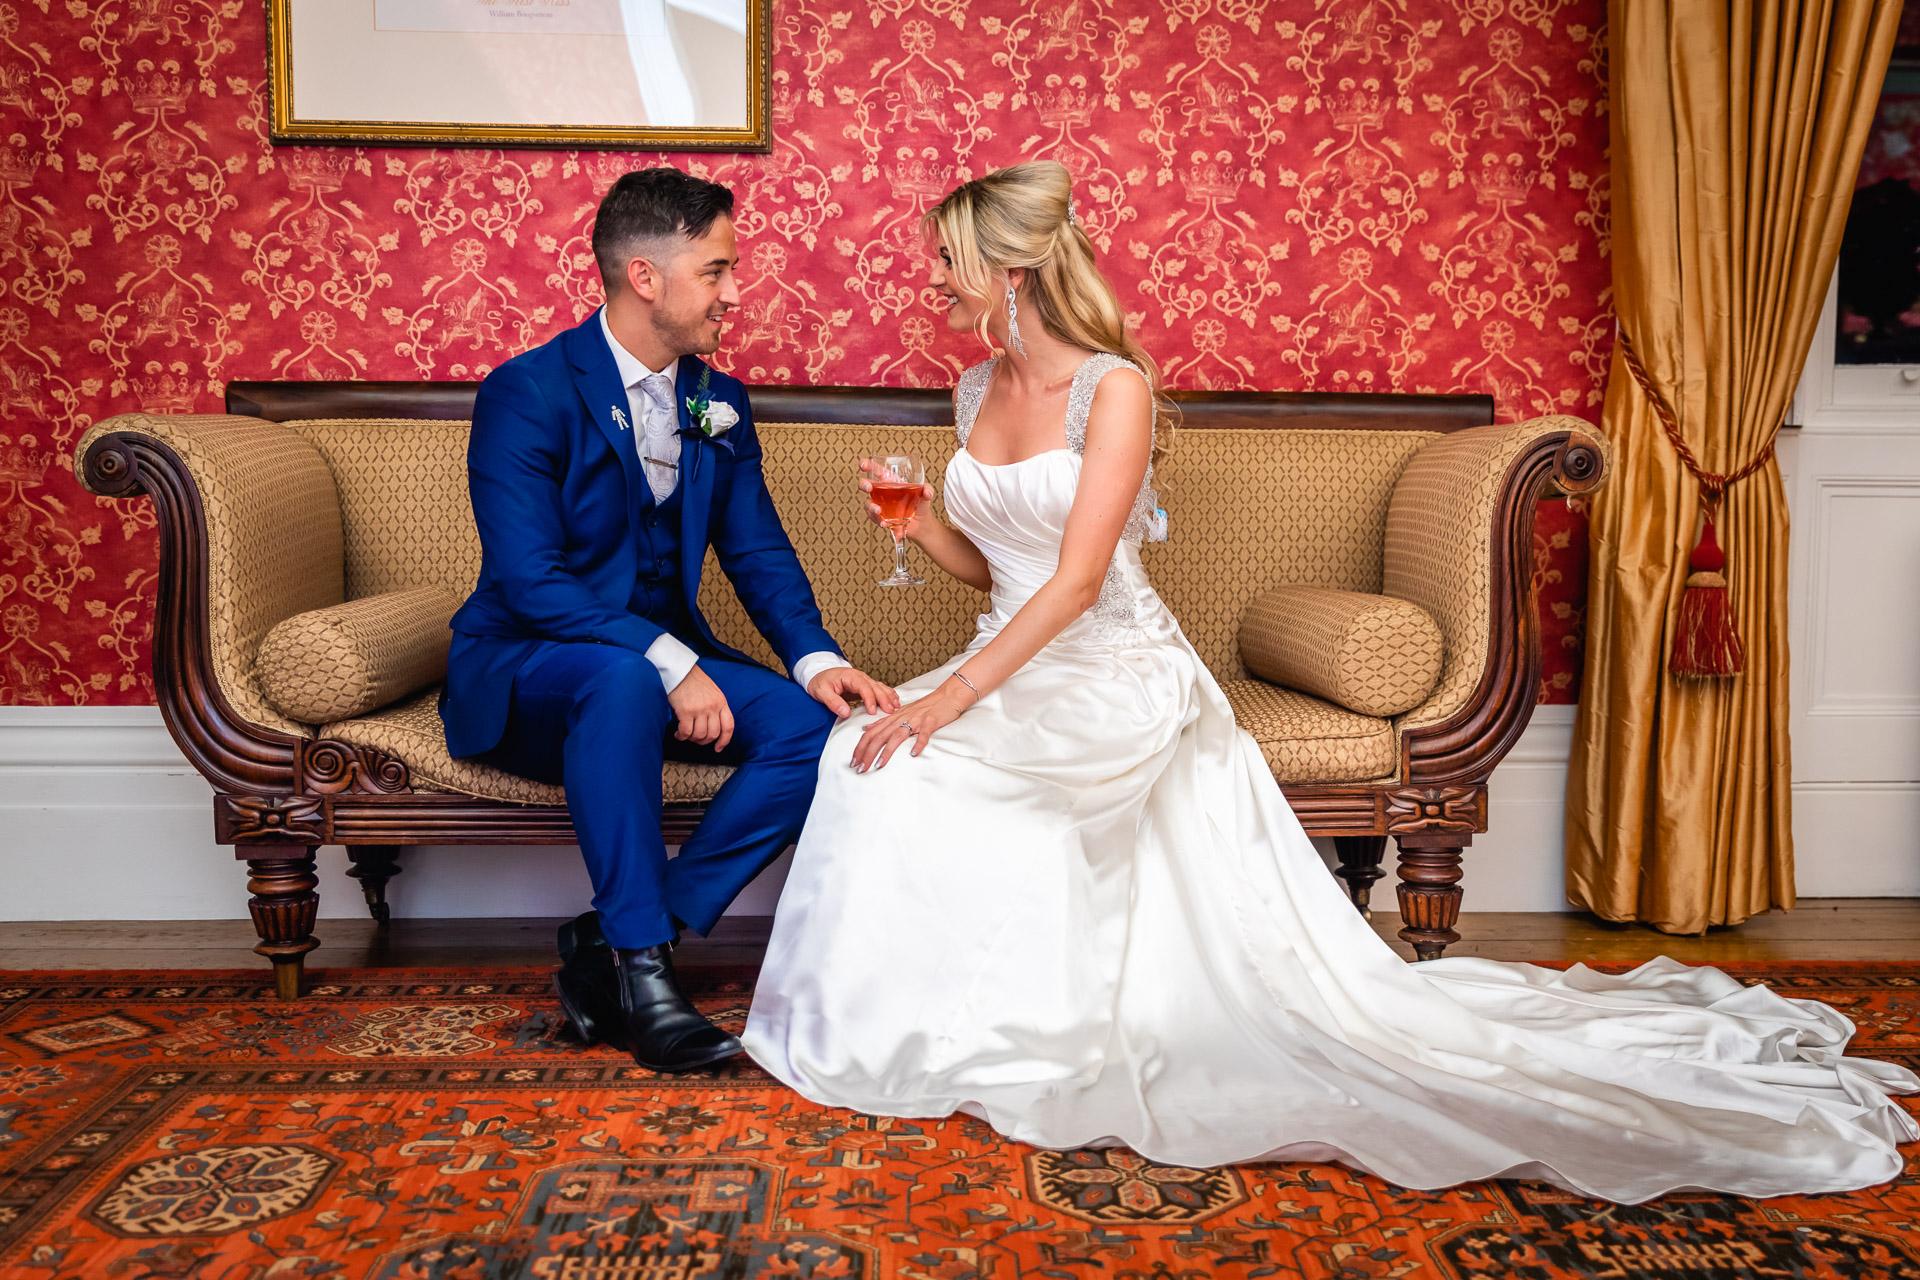 Wedding Reception in Fennes, Braintree